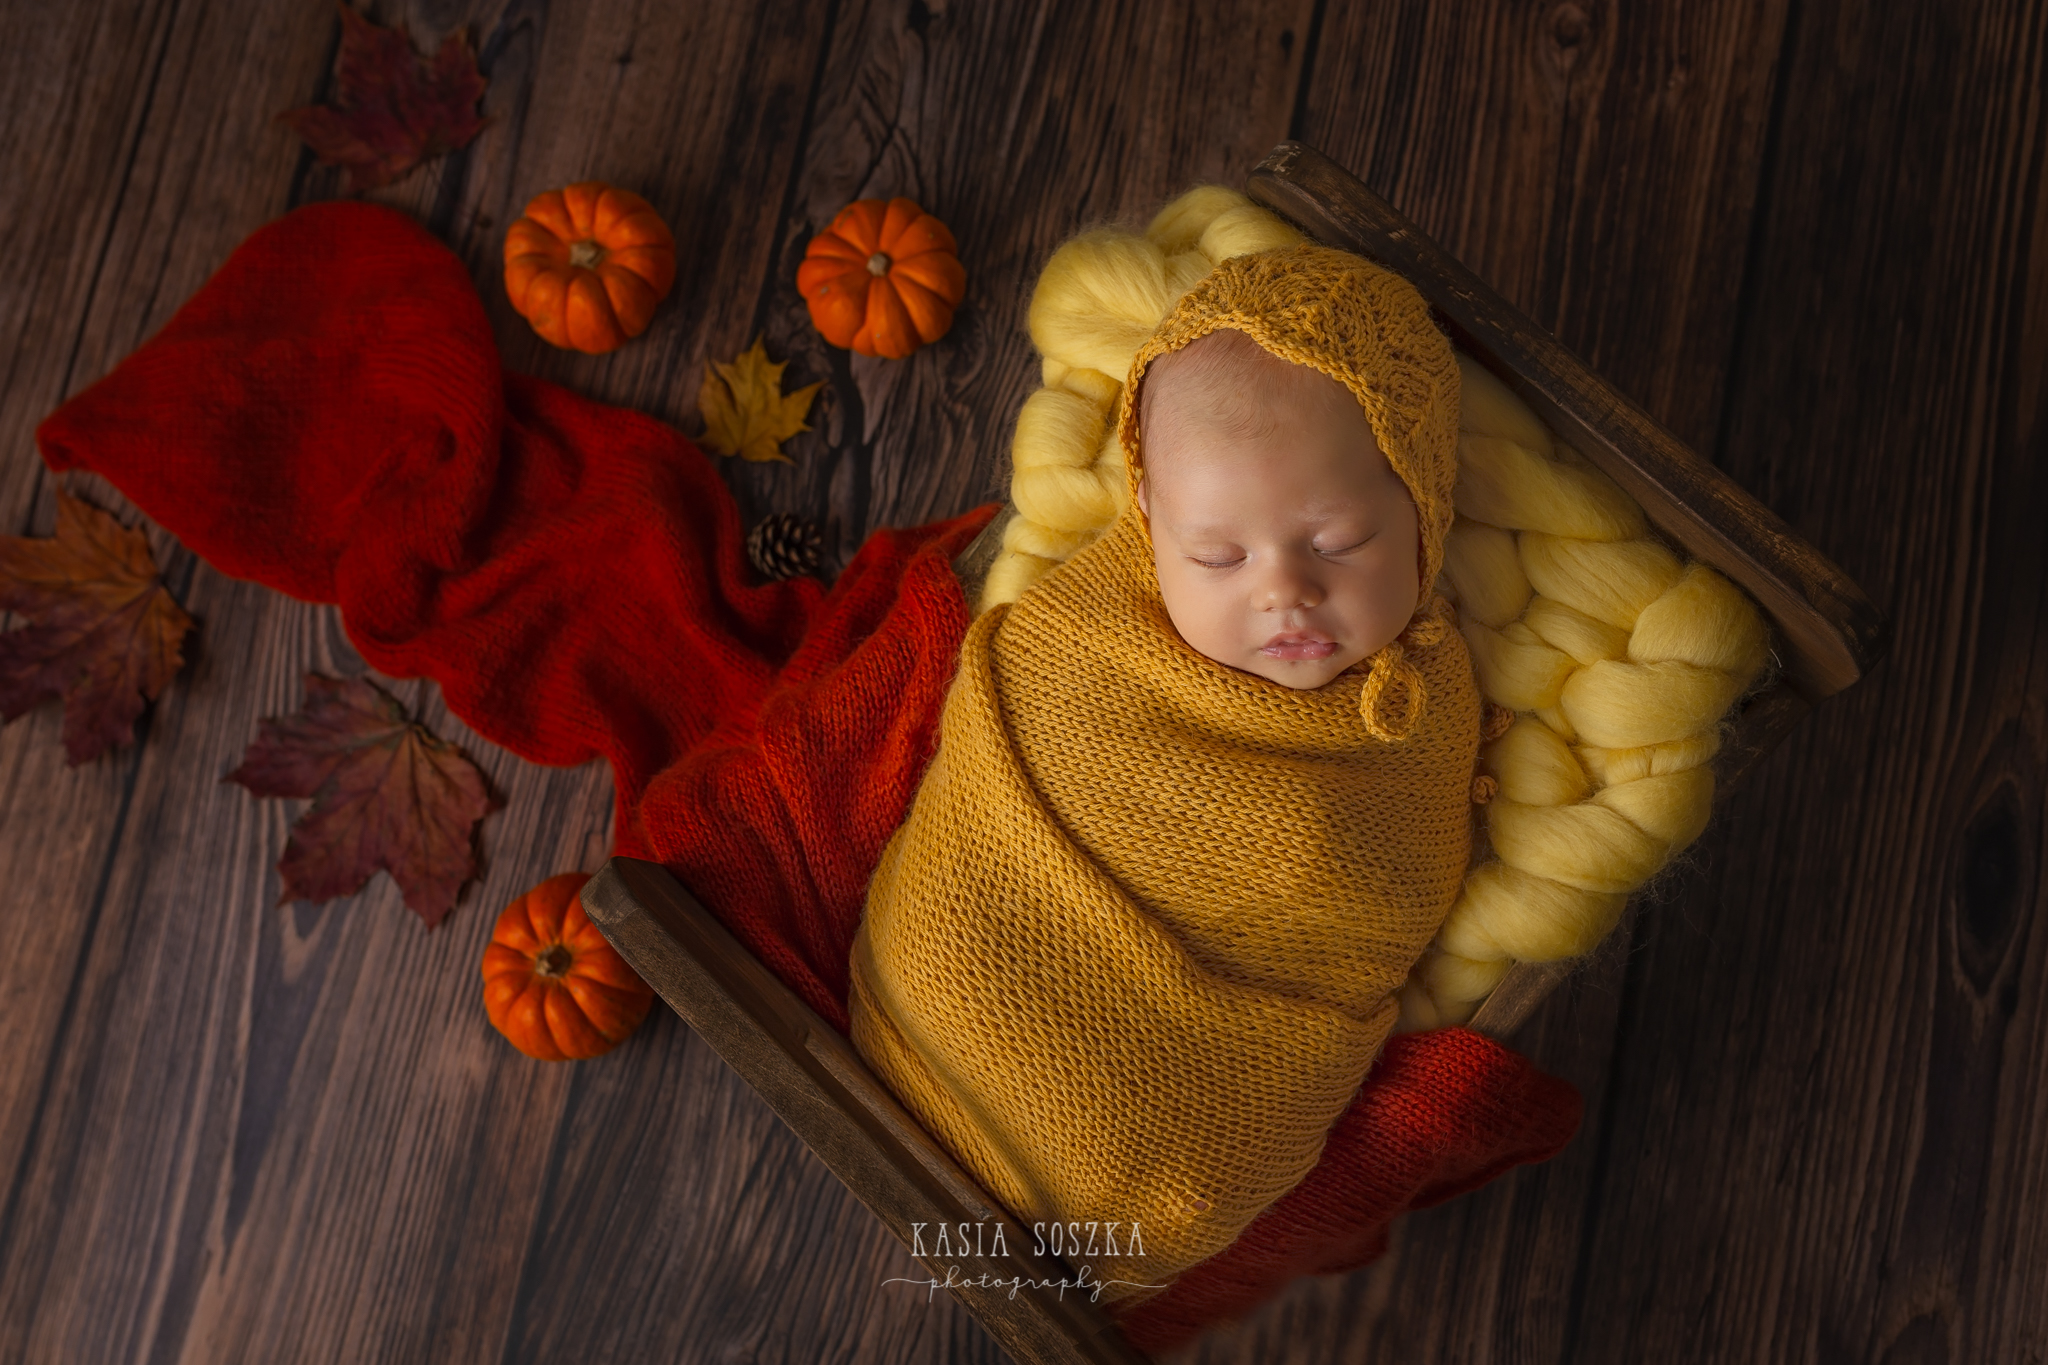 Newborn photography Leeds-York-Bradford-Harrogate: autumn themed newborn session in Leeds, Yorkshire. Cute newborn baby girl in an autumn set up